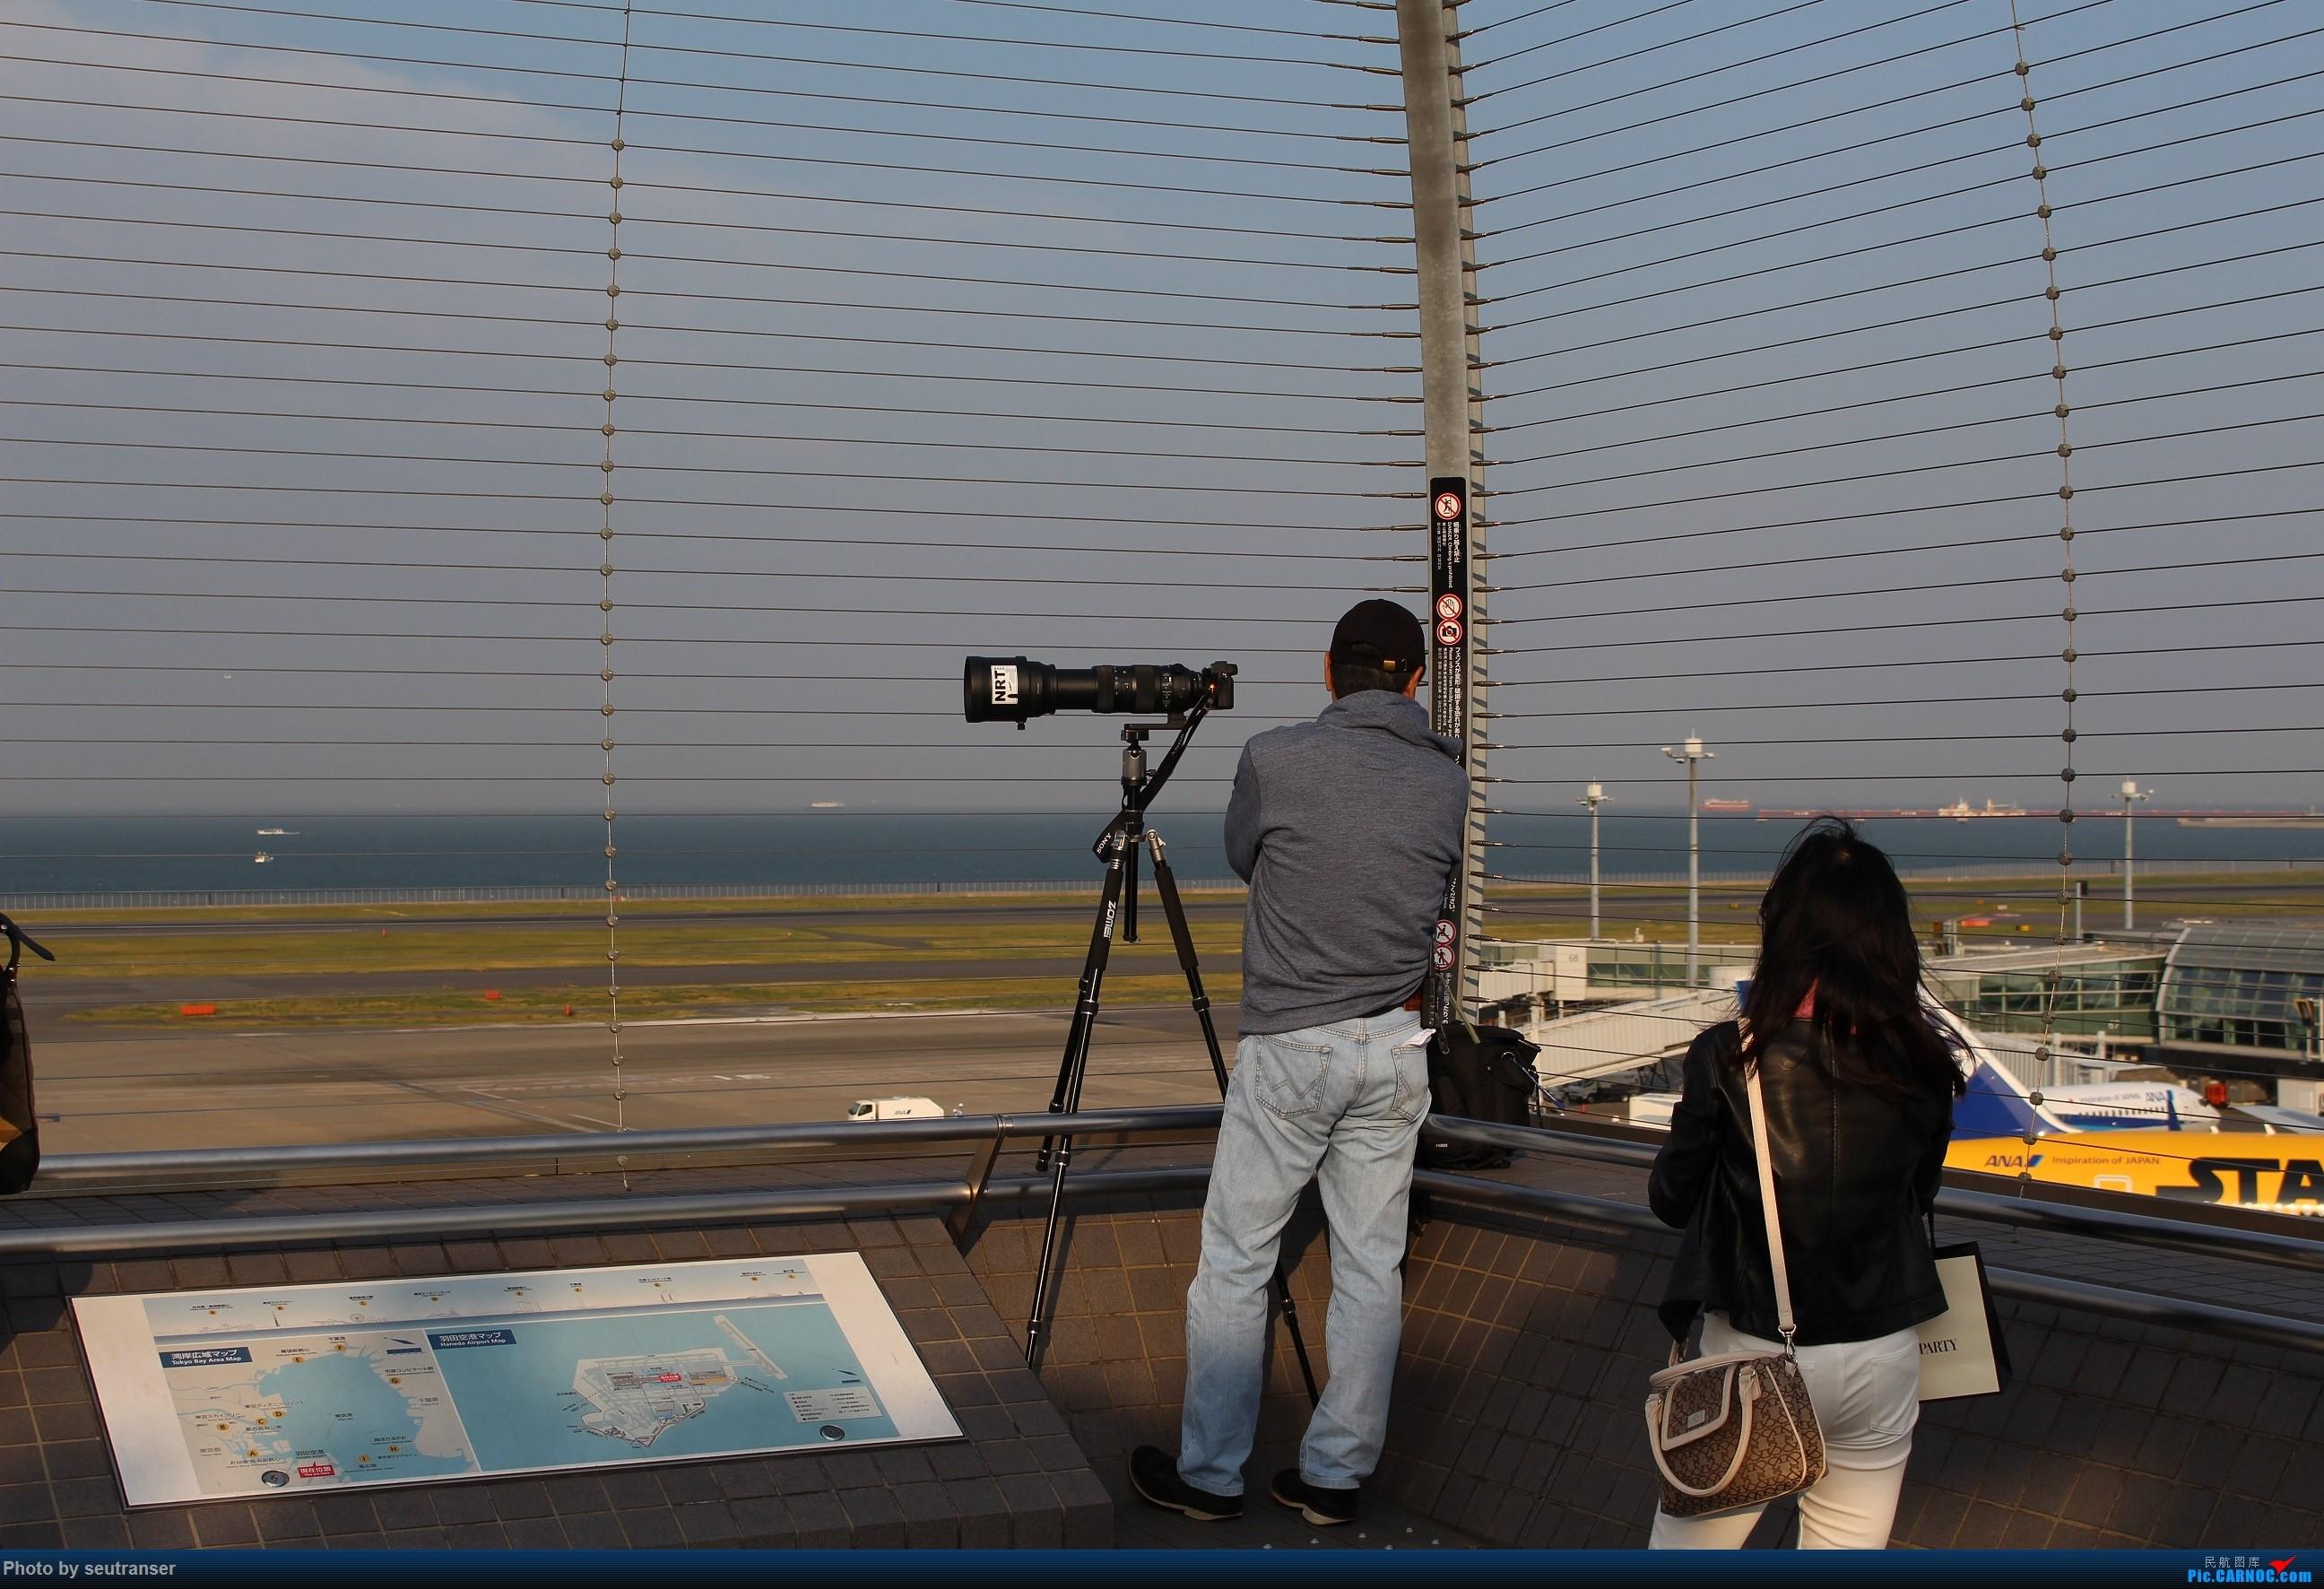 Re:[原创]迟到一年的游记,记第一次出国游 日本10天东航往返+ANA国内线+羽田机场拍机 BOEING 777-200ER JA743A 日本东京羽田国际机场  飞友